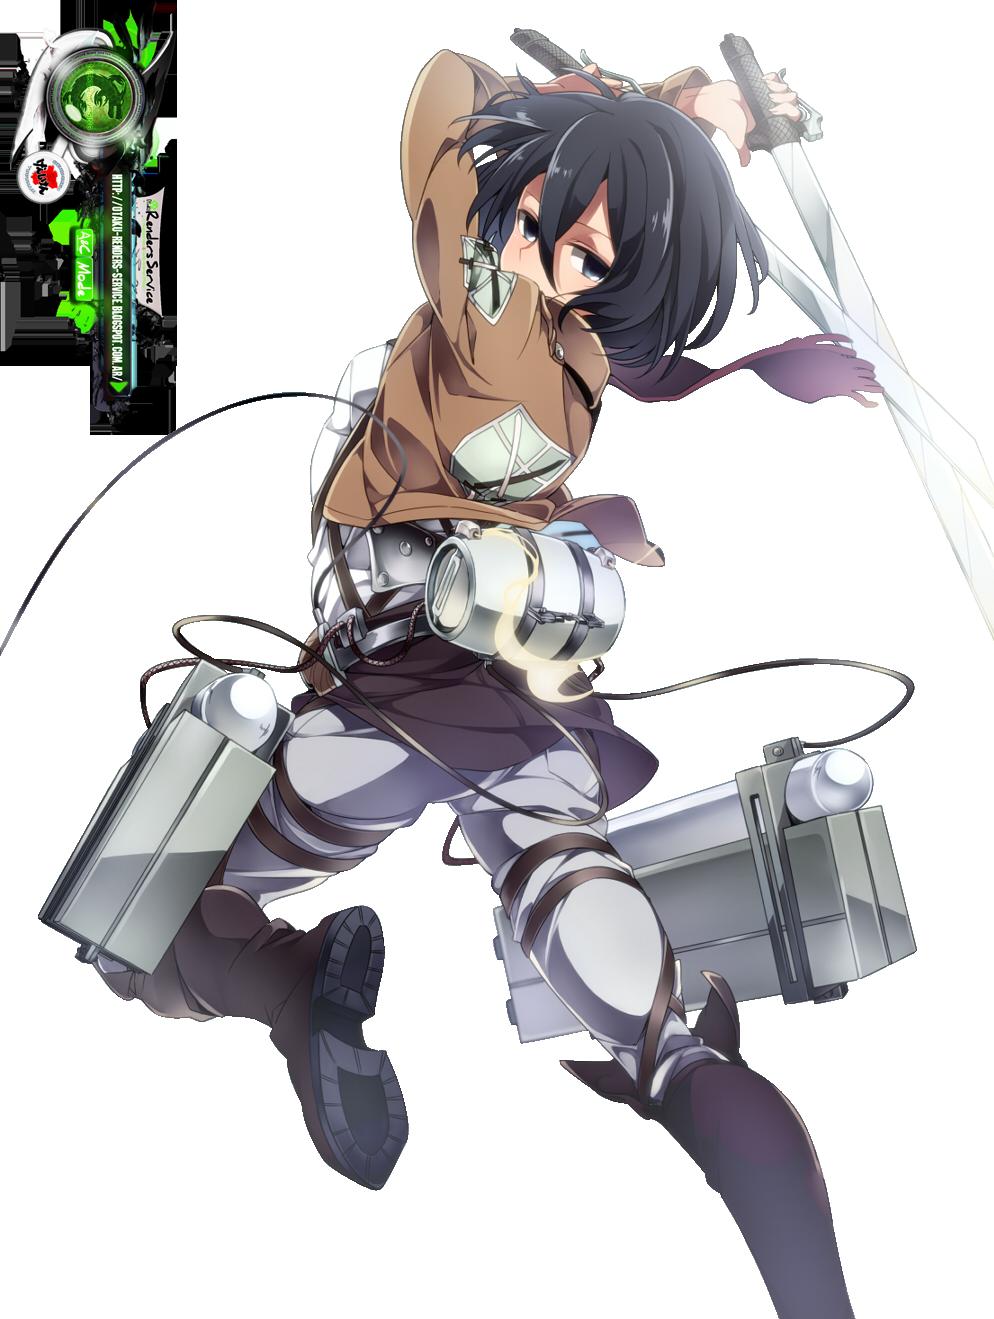 Mikasa Ackerman/Микаса Акерман